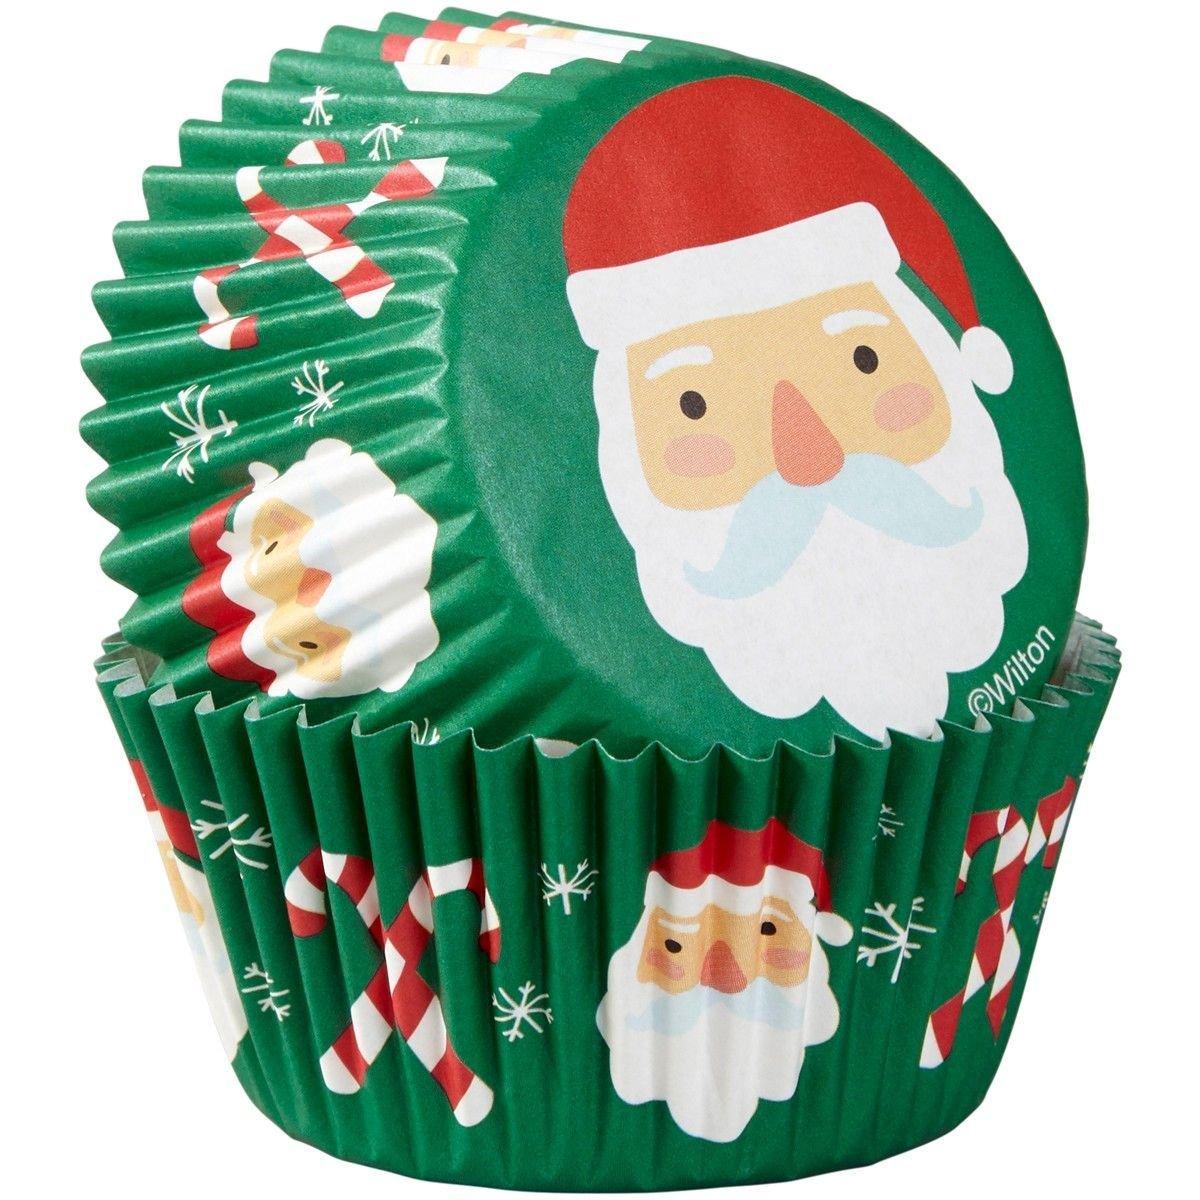 Wilton Christmas Cupcake Cases -SANTA & CANDY CANE - Θήκες Ψησίματος Αγ. Βασίλης & Γλειφιτζούρι 75 τεμ